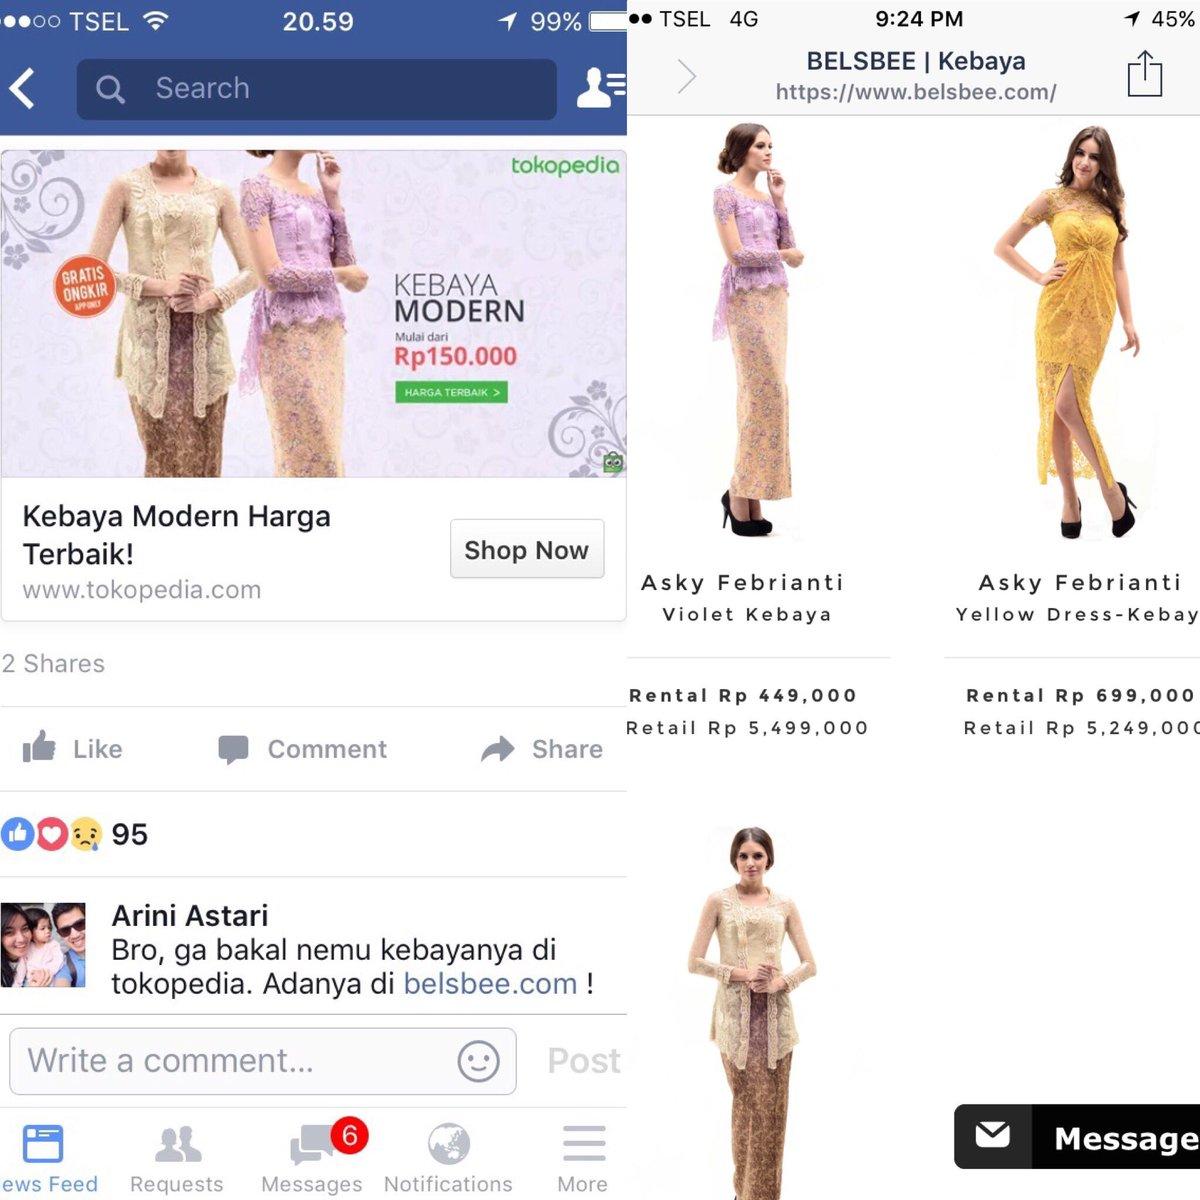 Meh..bad move @tokopedia ! Hire model, designer & photographer dong! Jangan maling images orang #tokopediamaling https://t.co/tsyZxE1lB9